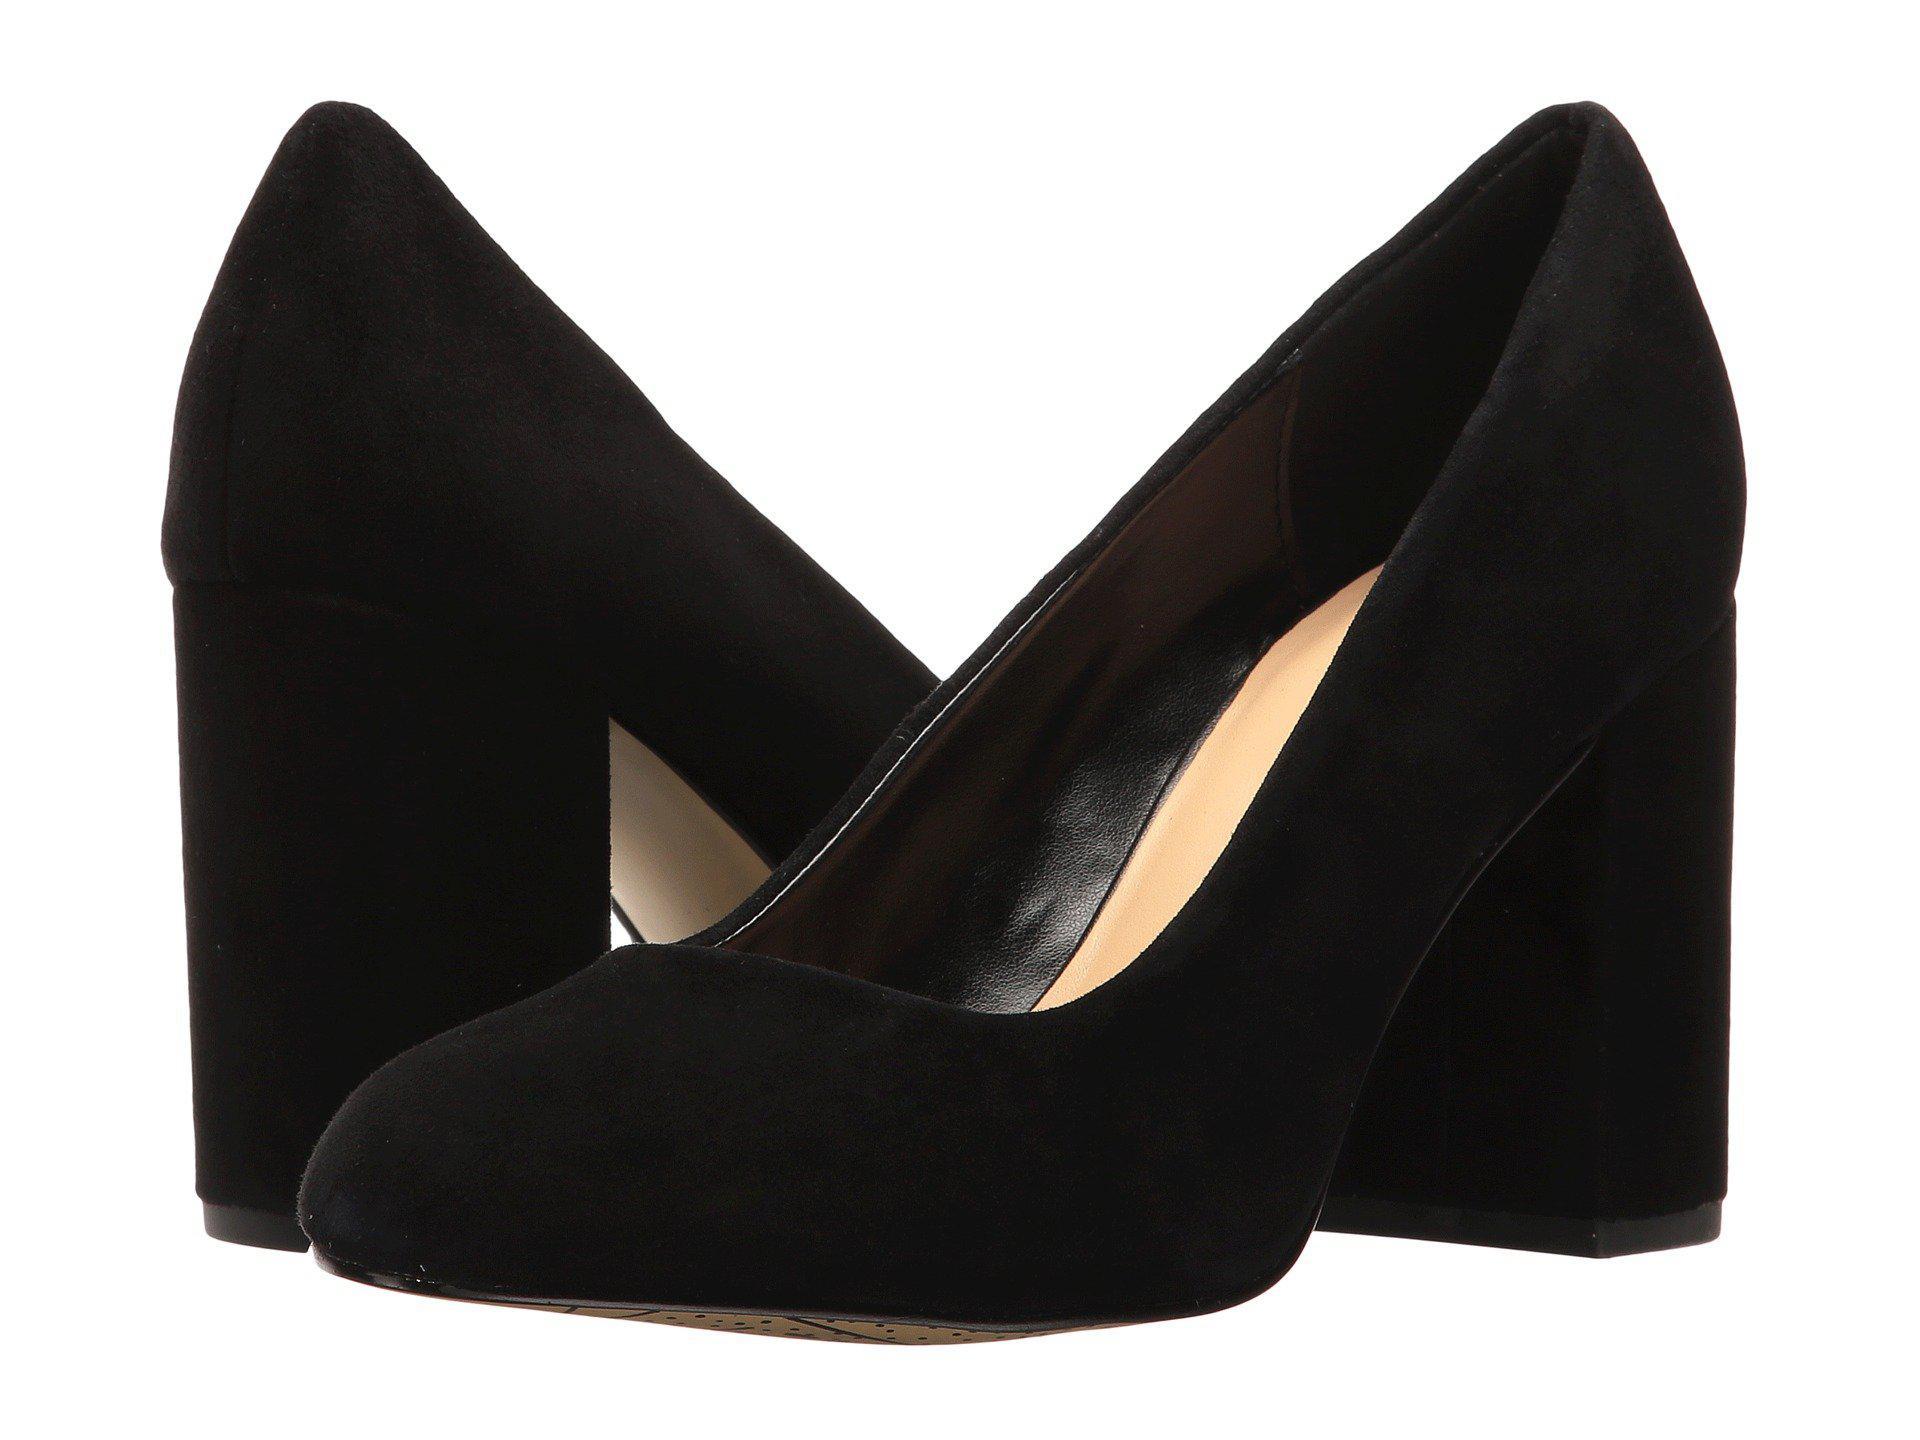 0885963f25 Lyst - Bella Vita Nara (blush Kid Suede Leather) High Heels in Black